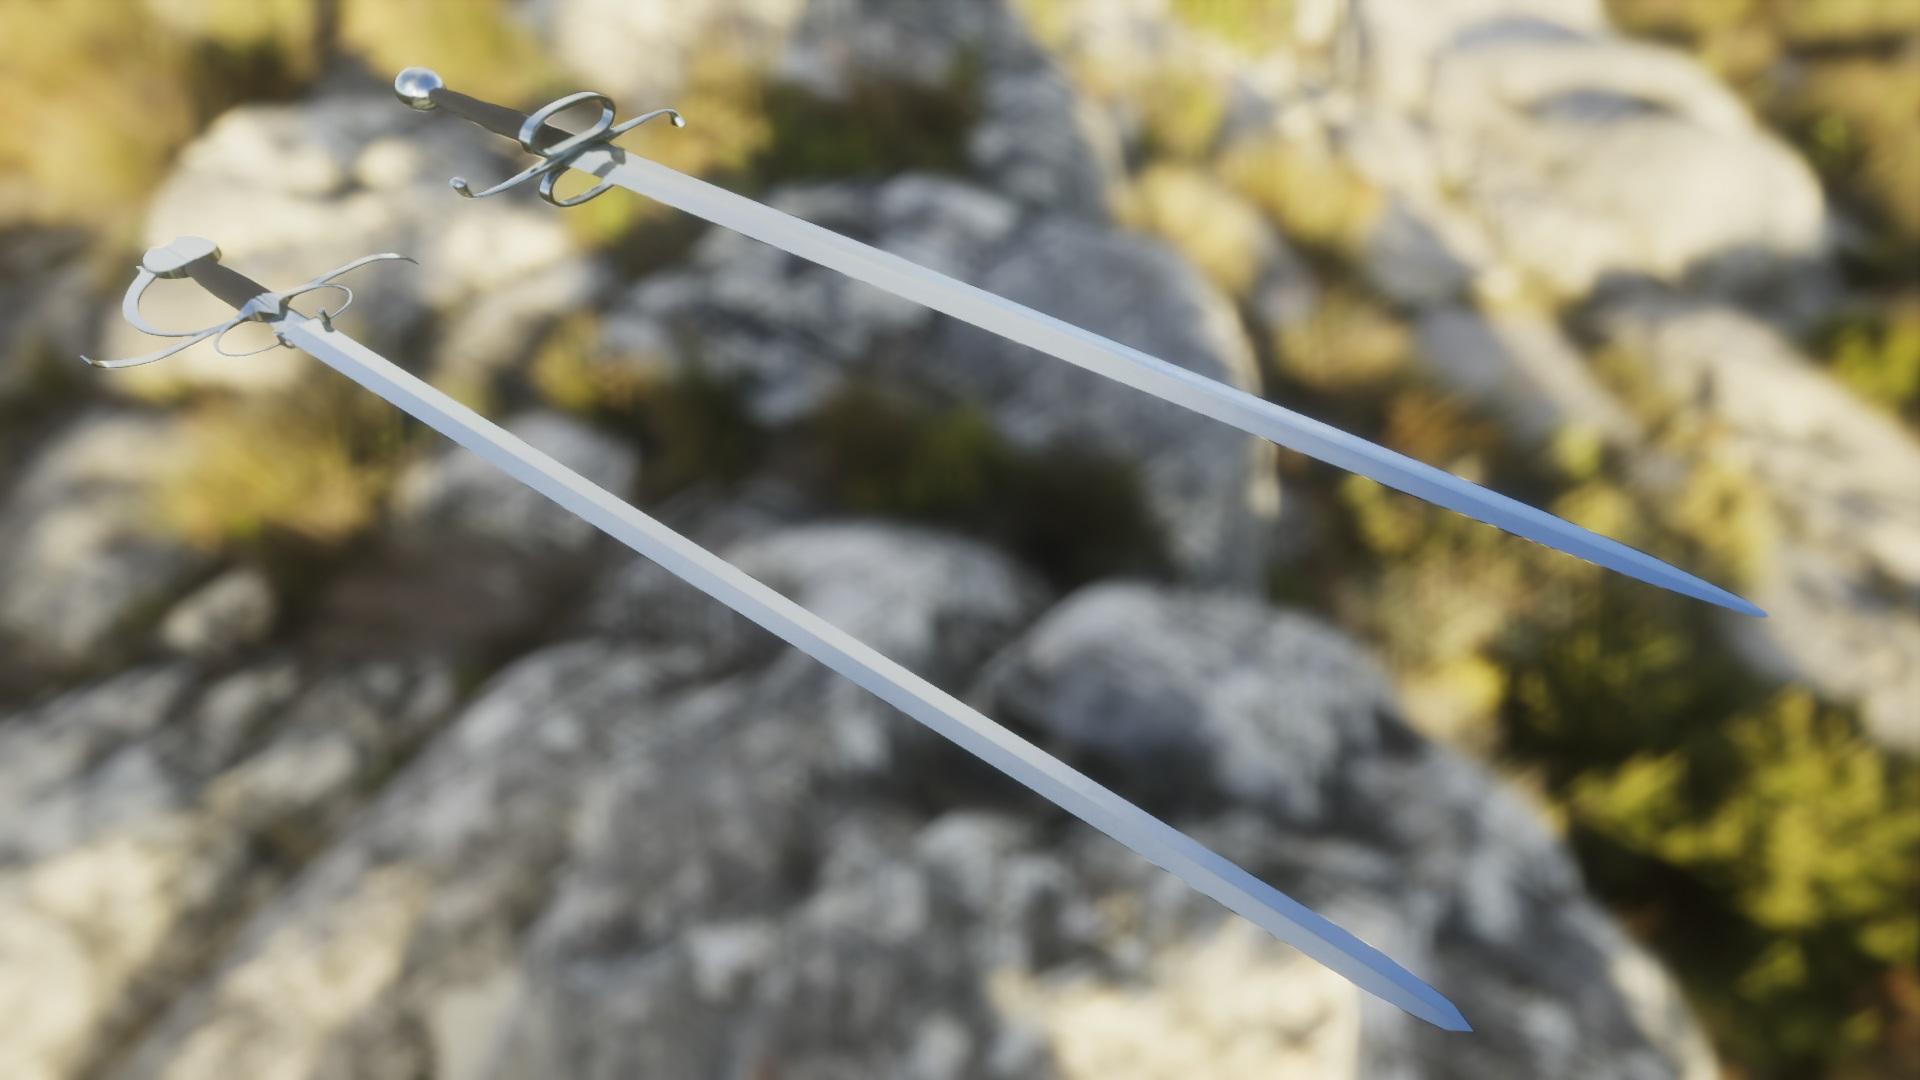 swords_3.jpg